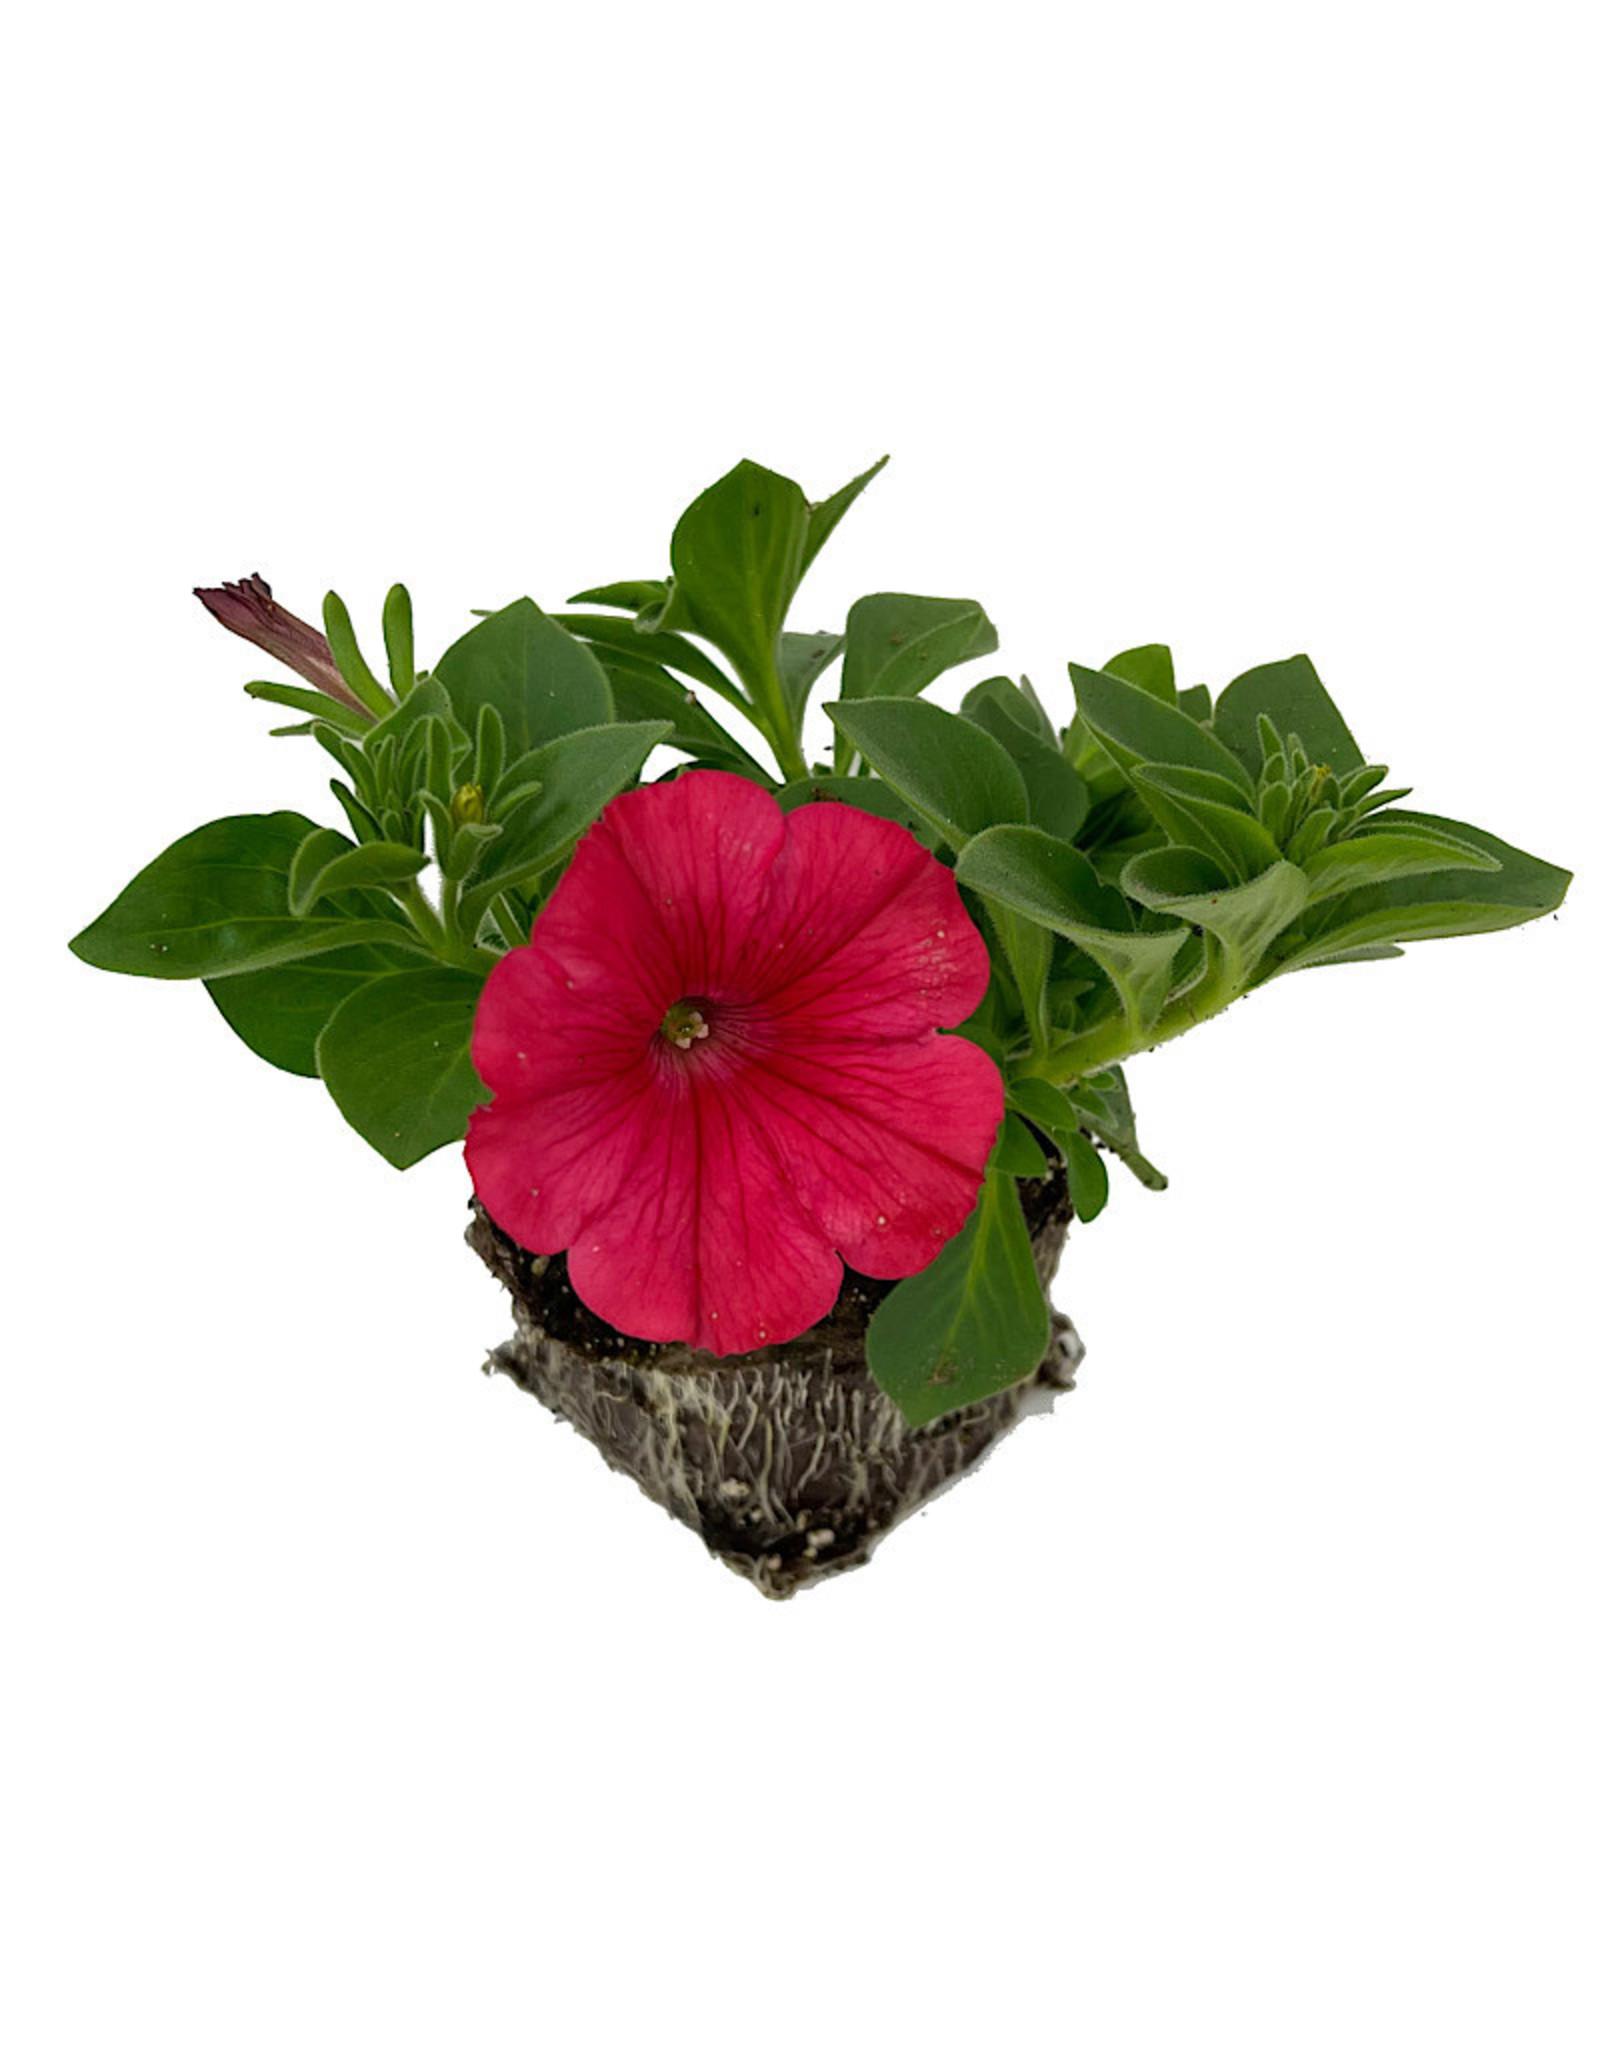 Petunia 'ColorRush Watermelon Red' 4 inch